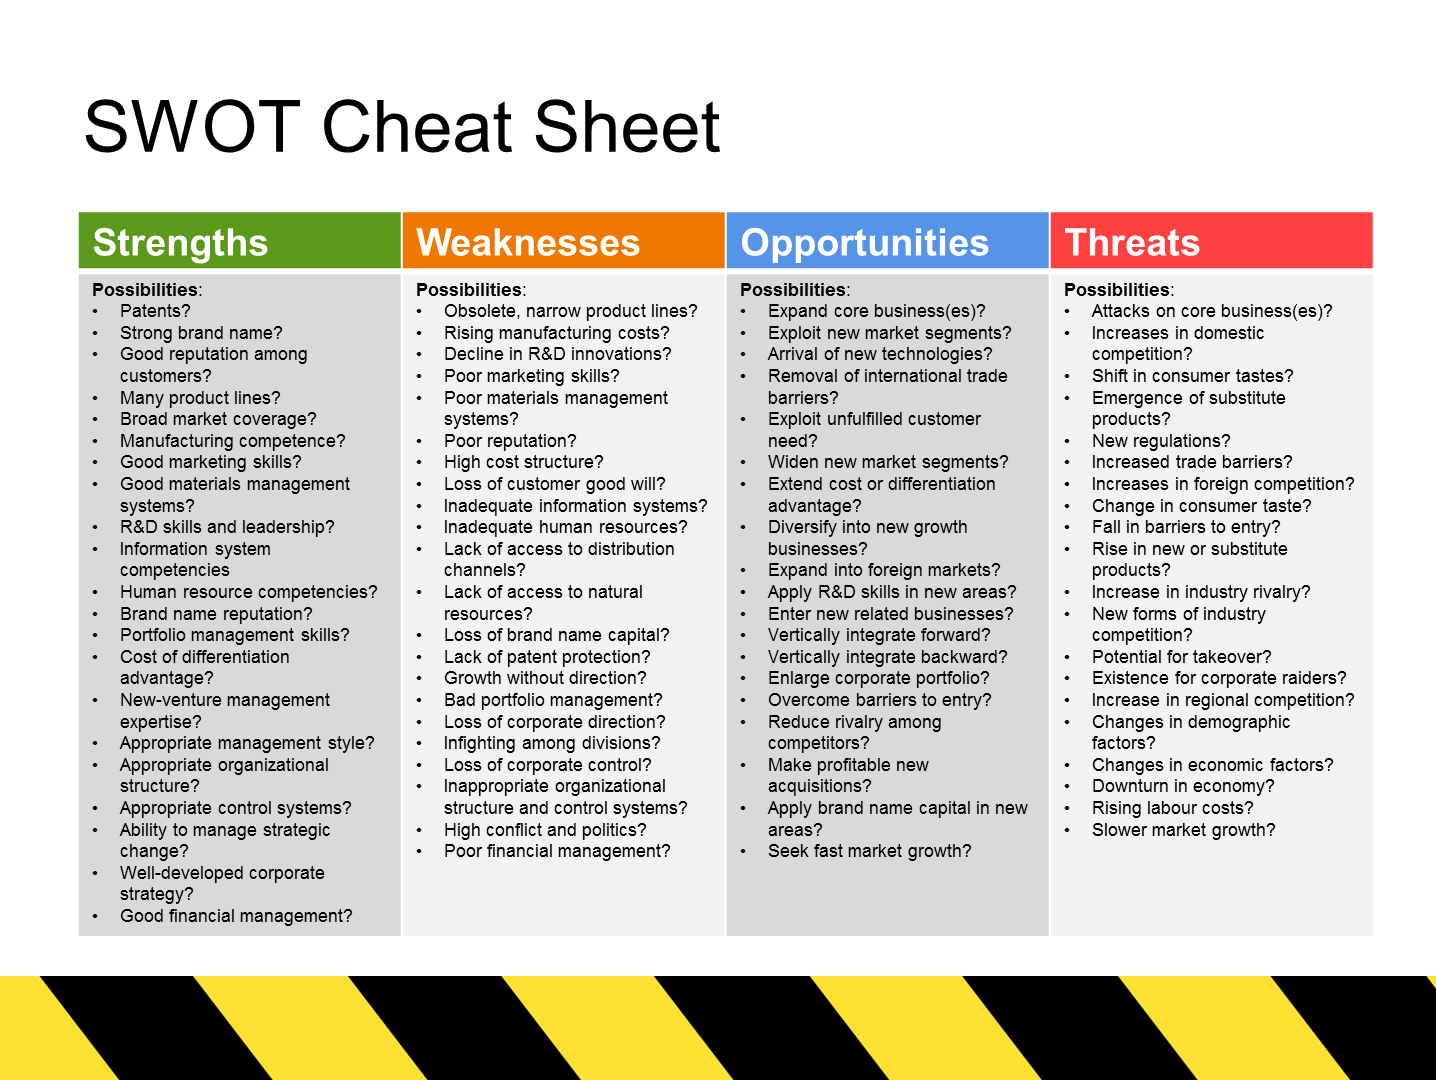 SWOT Analysis Templates: 24 Slides of Strategic SWOT ...